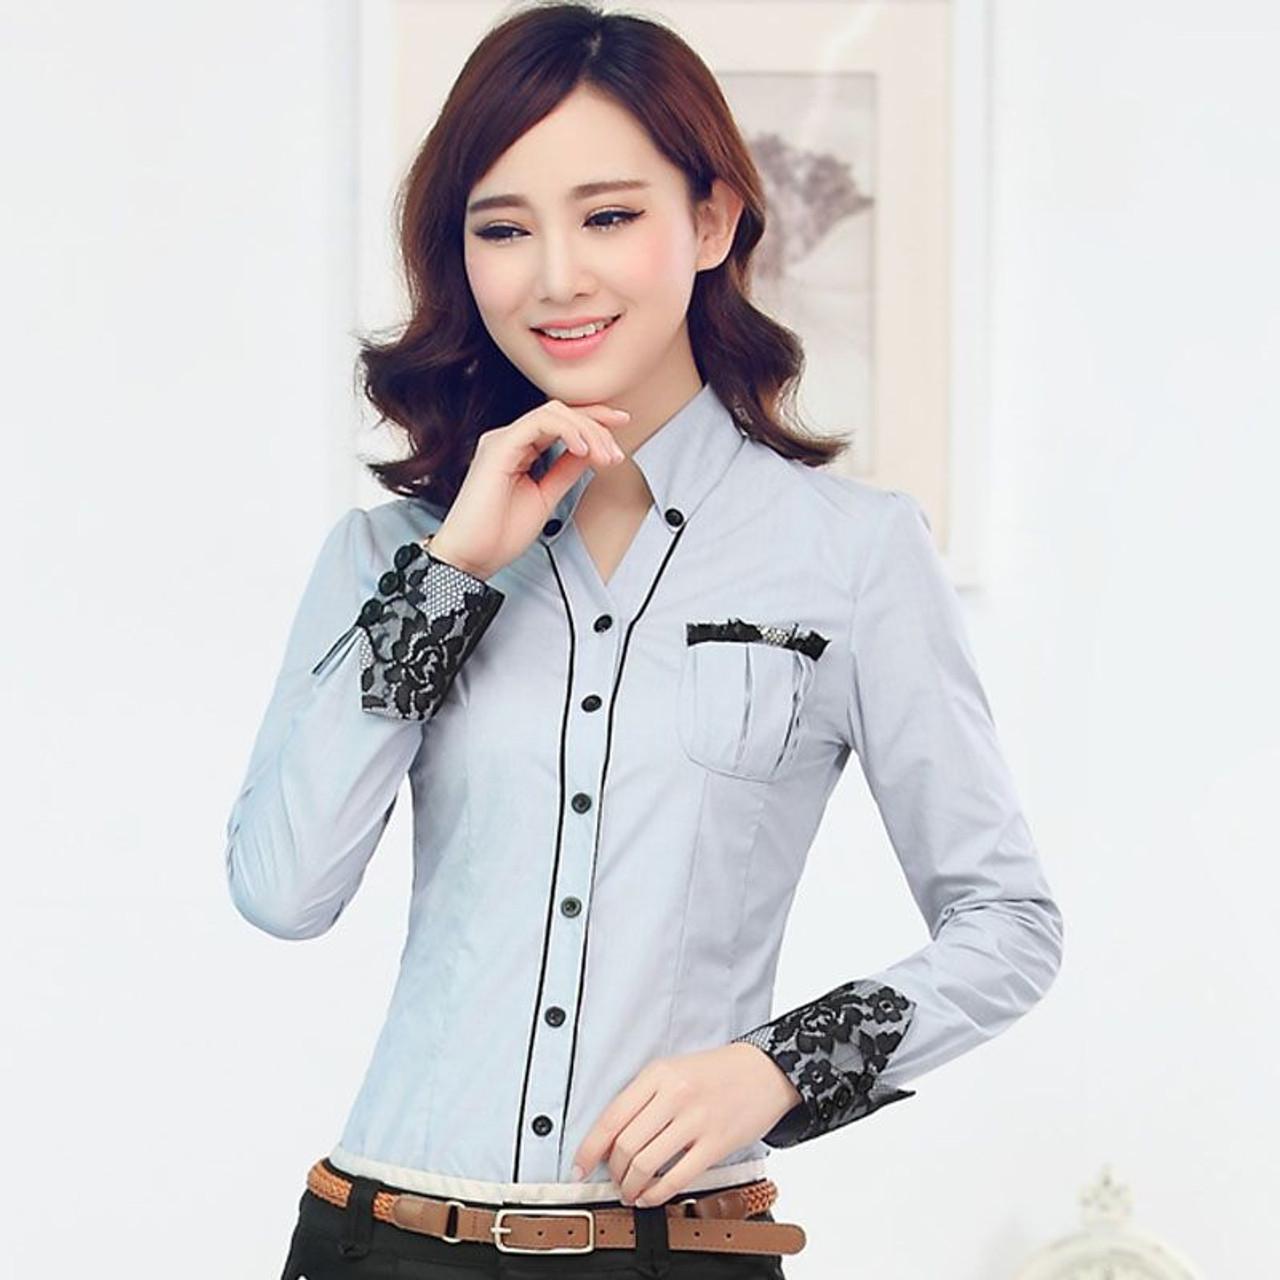 504622e367 Formal women long sleeve shirt 2019 New slim elegant blouses shirts ladies  white blue gray office work plus size clothes tops